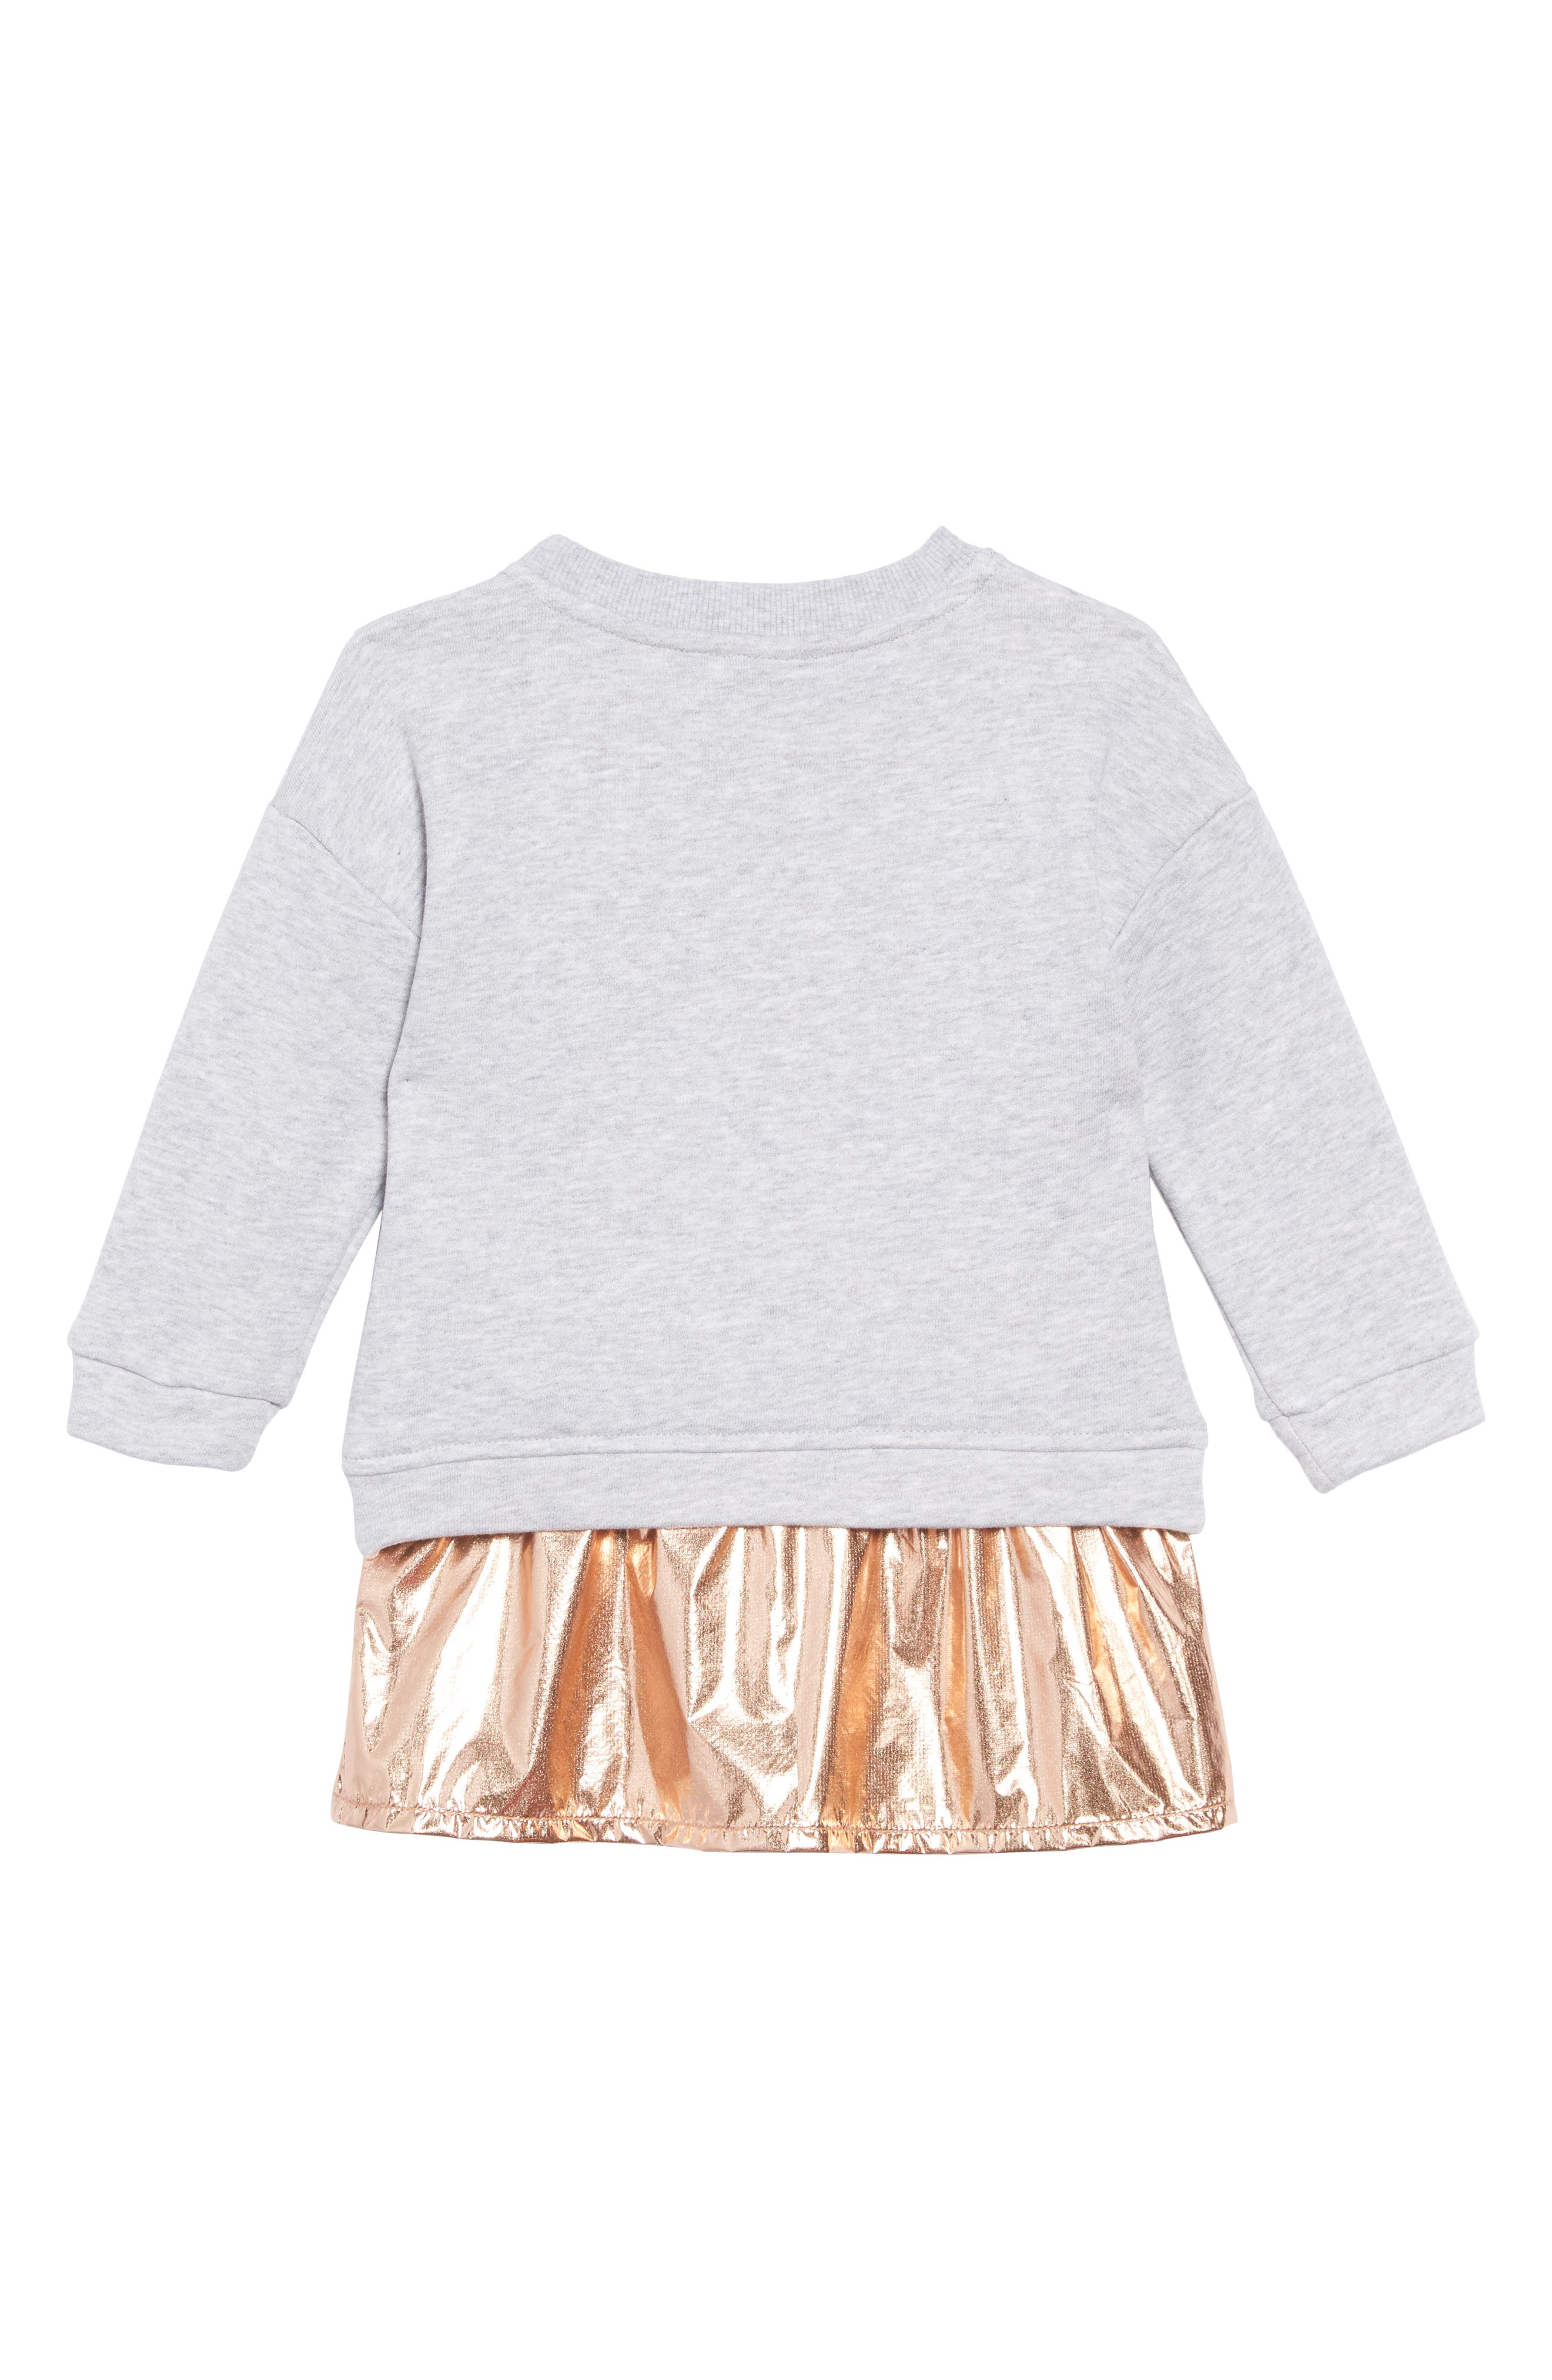 Metallic Graphic Sweatshirt & Dress Set,                             Alternate thumbnail 2, color,                             COPPER